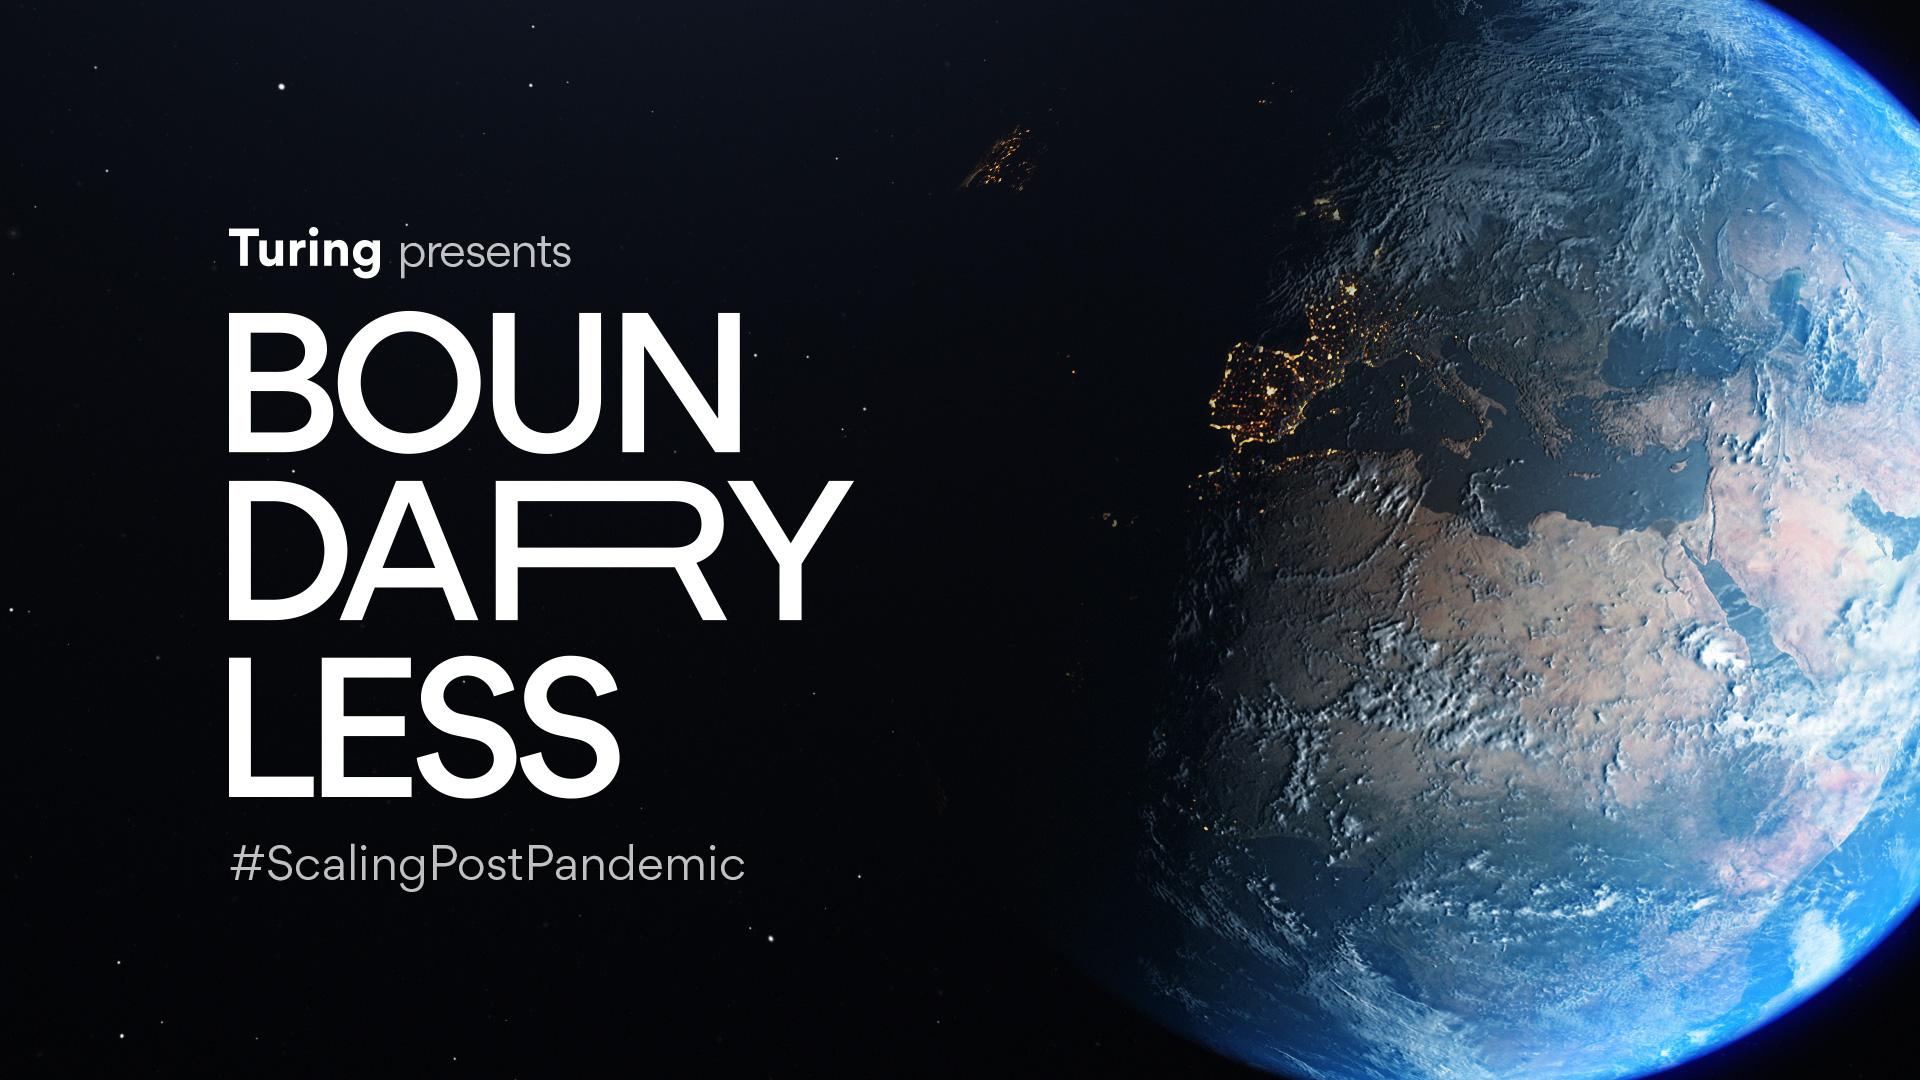 Boundaryless: #ScalingPostPandemic